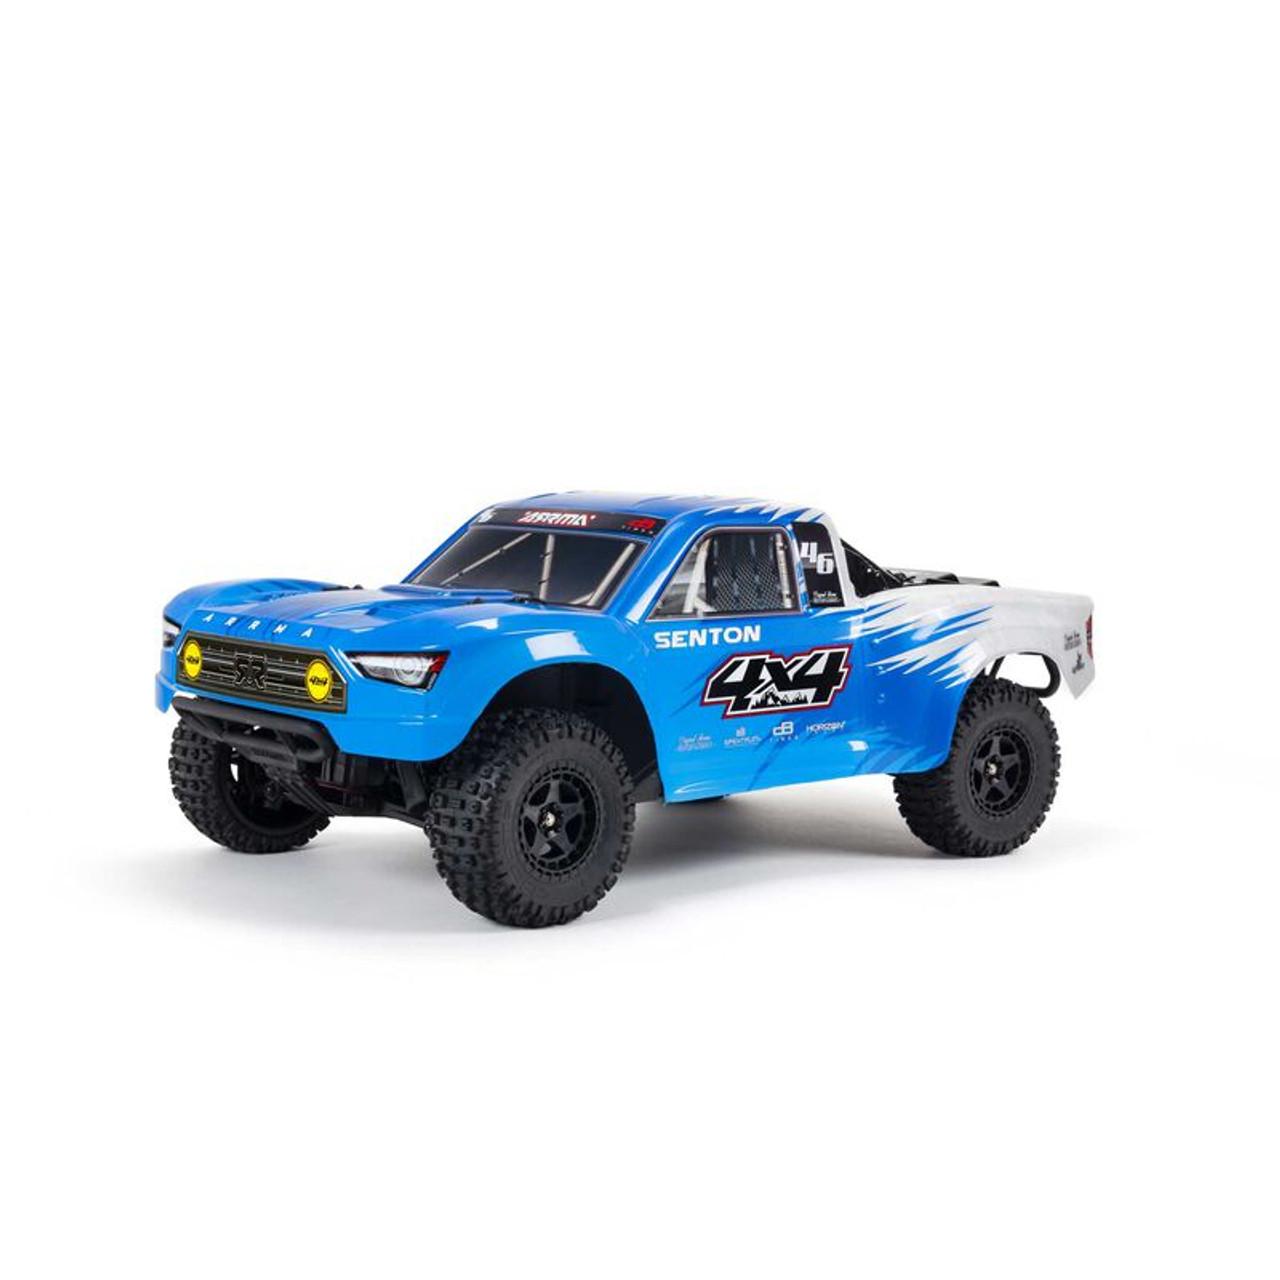 Arrma Senton 4x4 V3 550 Mega RTR 1/10 Short Course Truck (Blue) w/ Spektrum SLT3 2.4GHz Radio